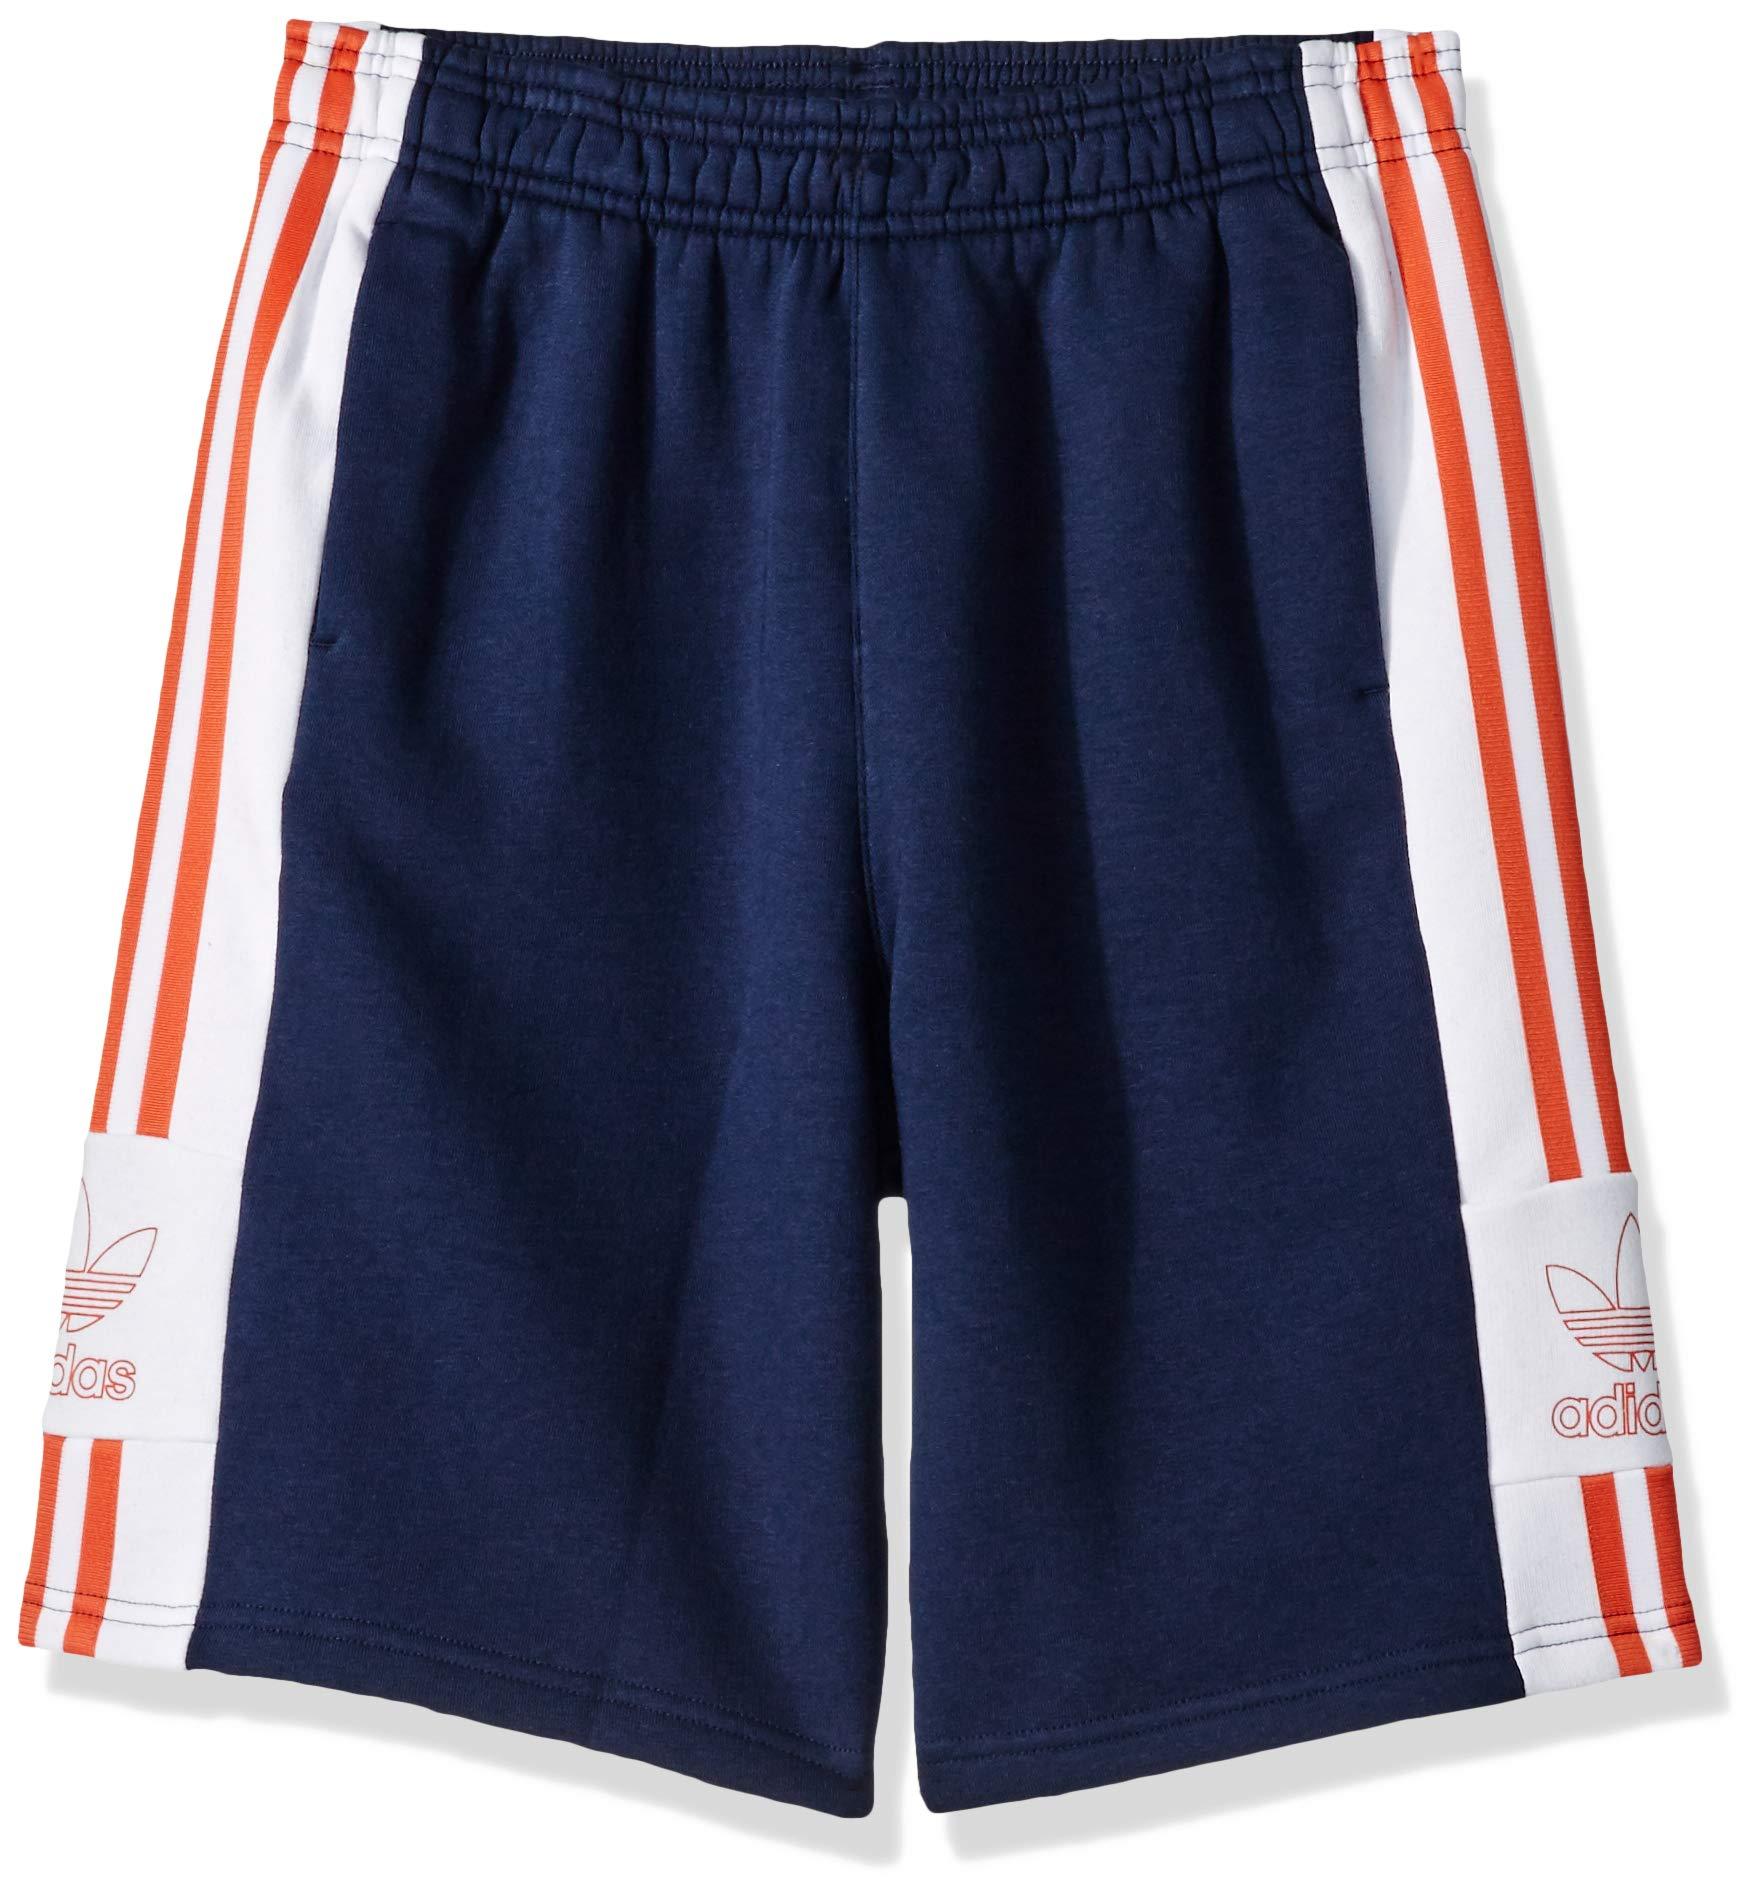 adidas Originals Boys' Big Outline Tees, Collegiate Navy/White/raw Amber, Small